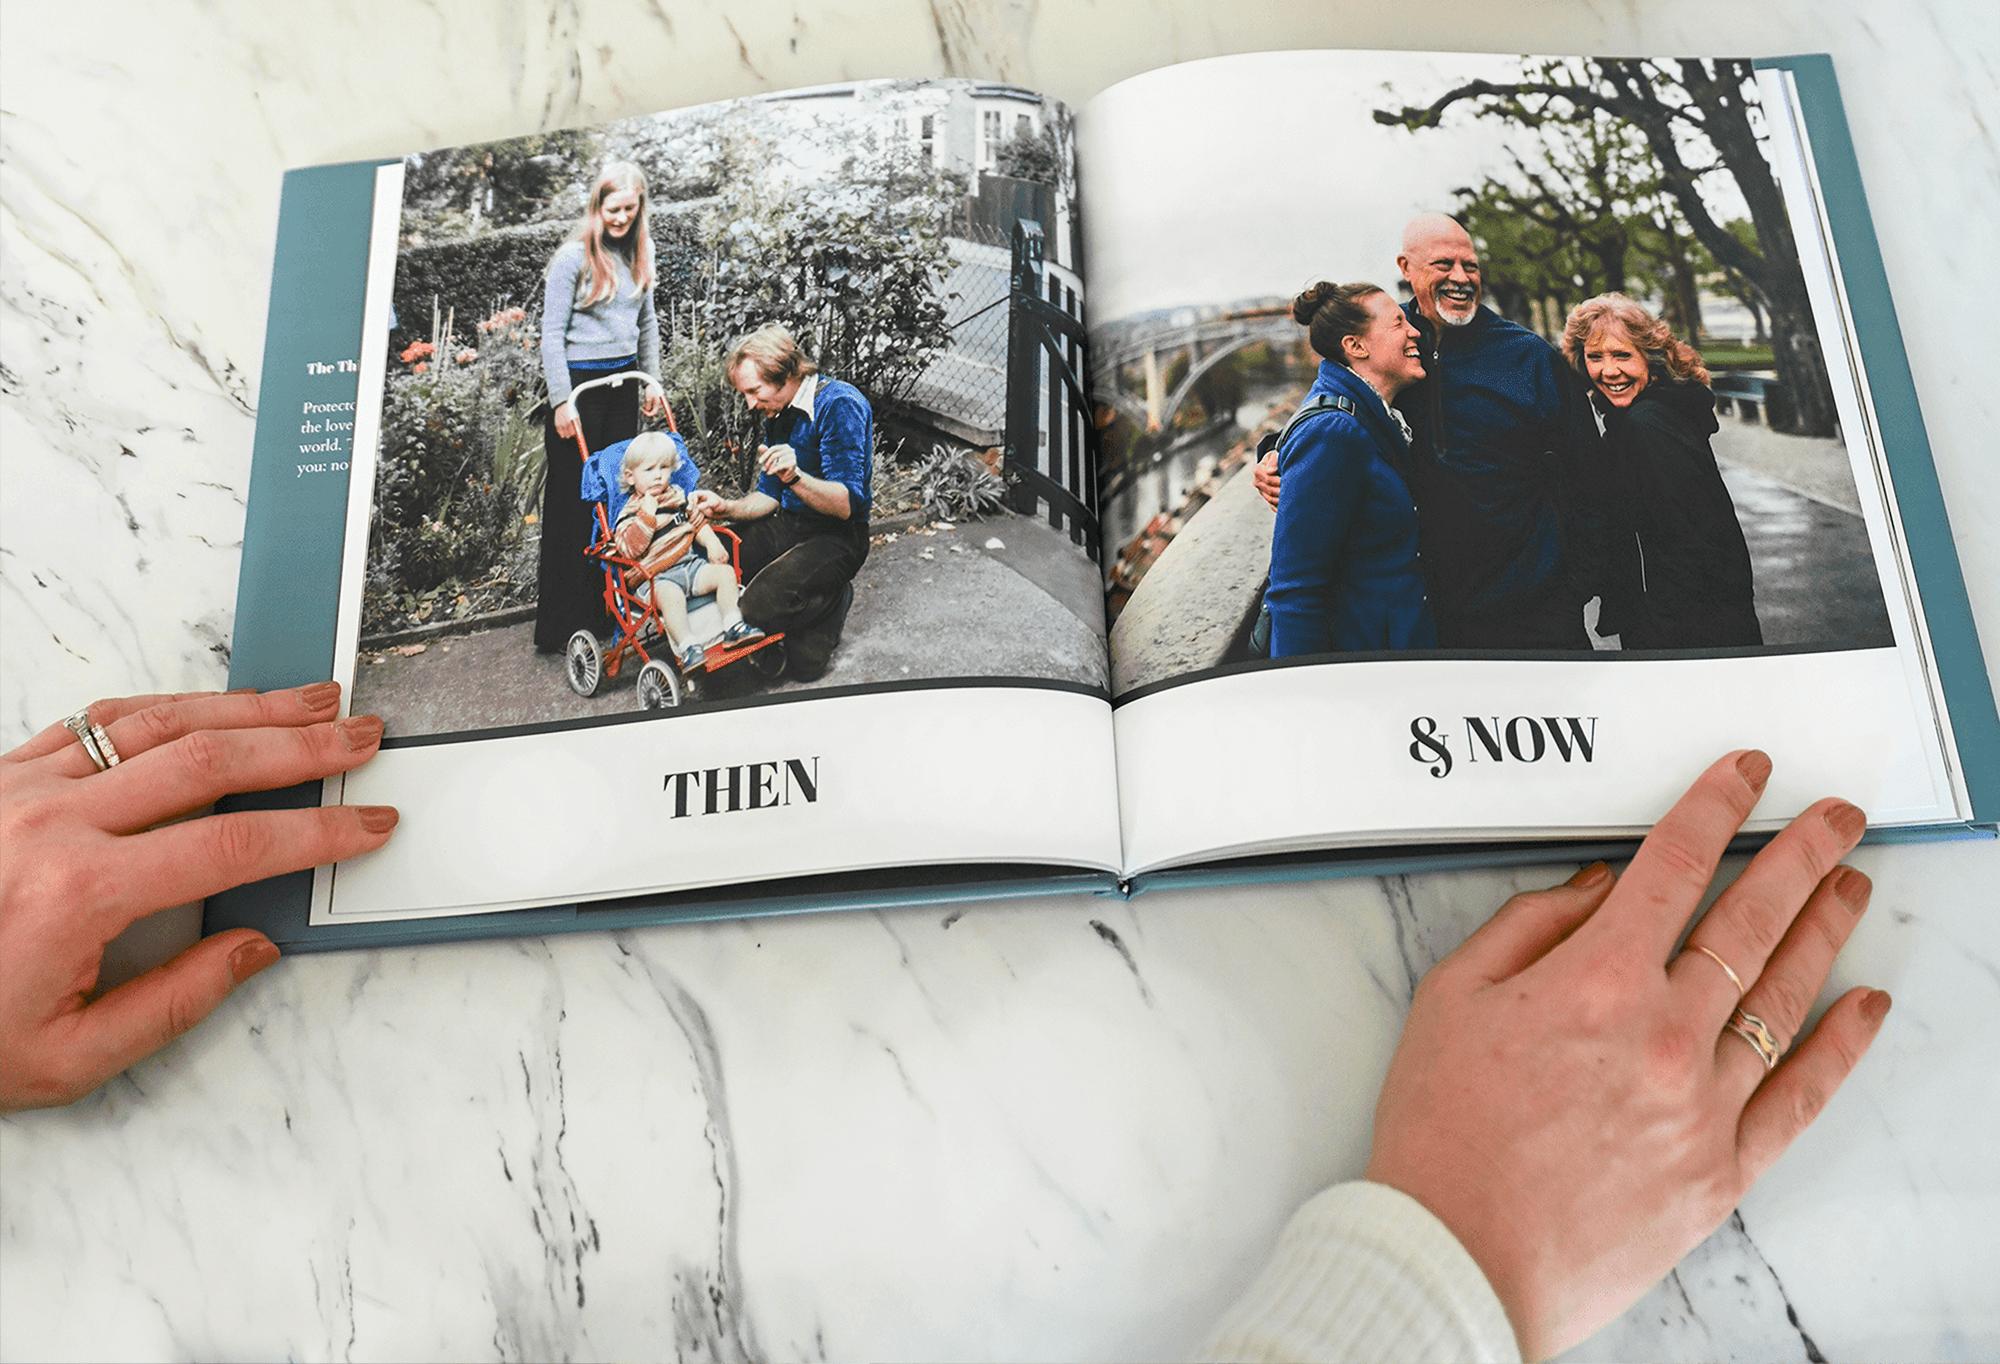 Celebrate big milestones with photo album gift